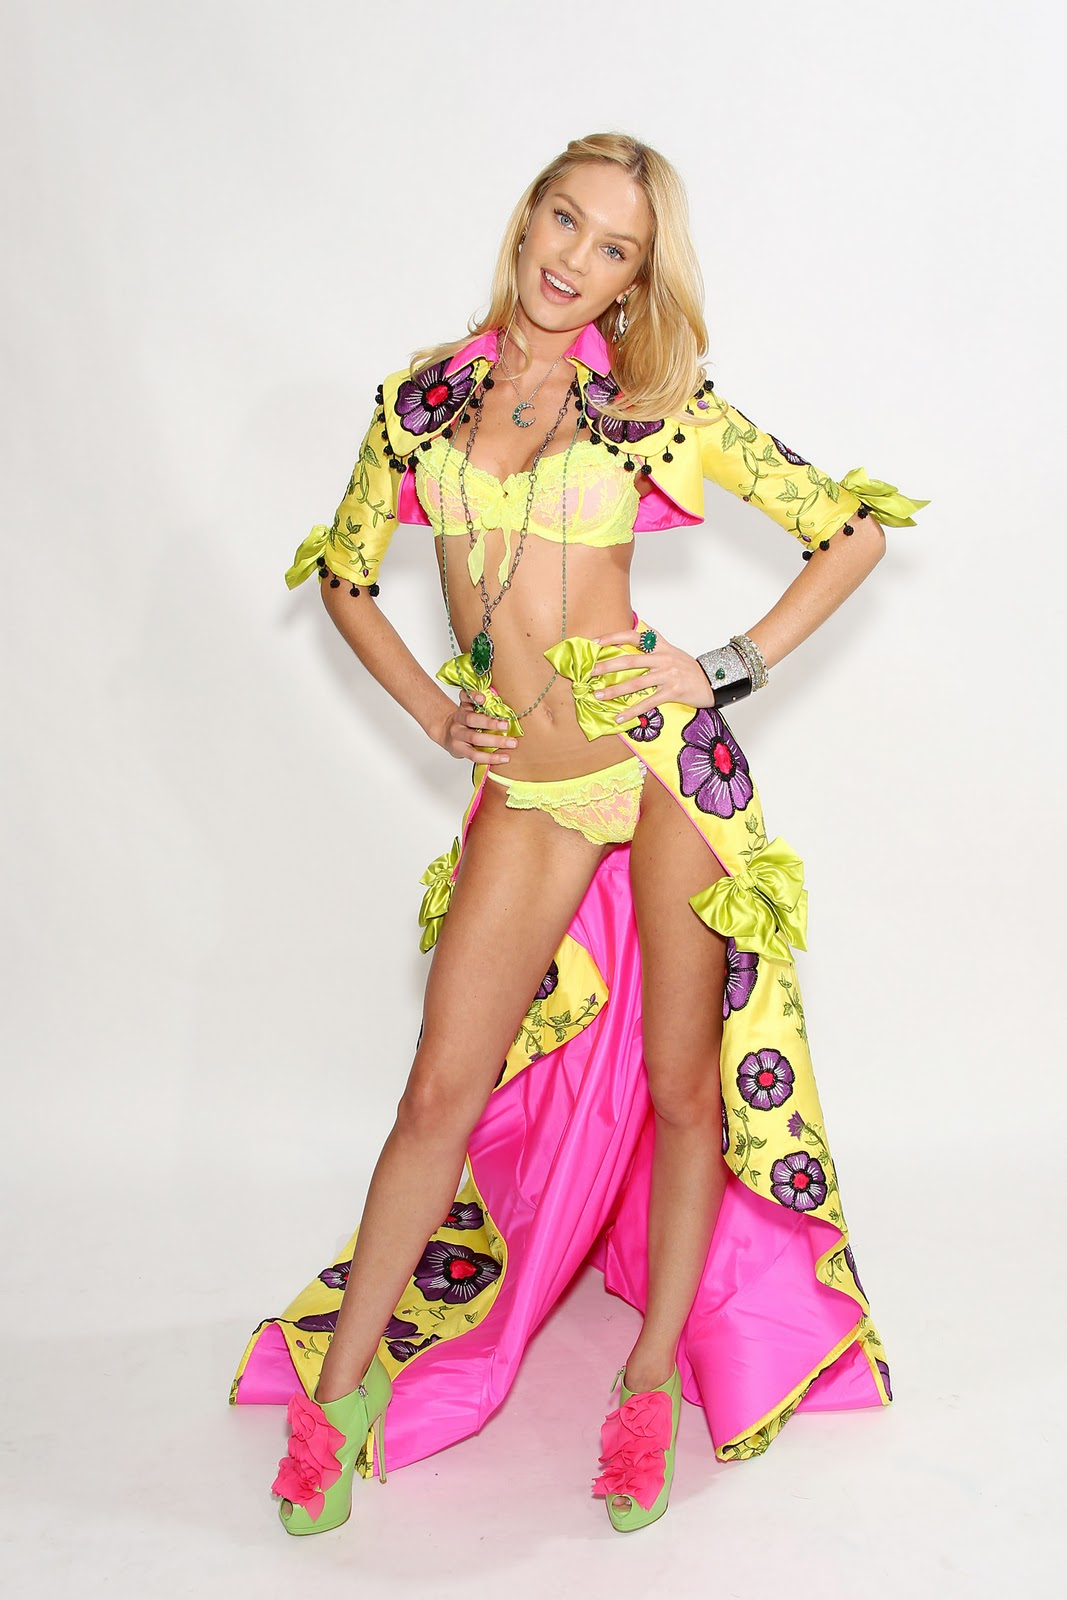 http://2.bp.blogspot.com/-J1pxlepPlJw/Twv-UdSNn4I/AAAAAAAAEFM/VNXe-RL8Wjw/s1600/fashion-show-fittings-2011-candice-swanepoel-1-victorias-secret-hi-res.jpg